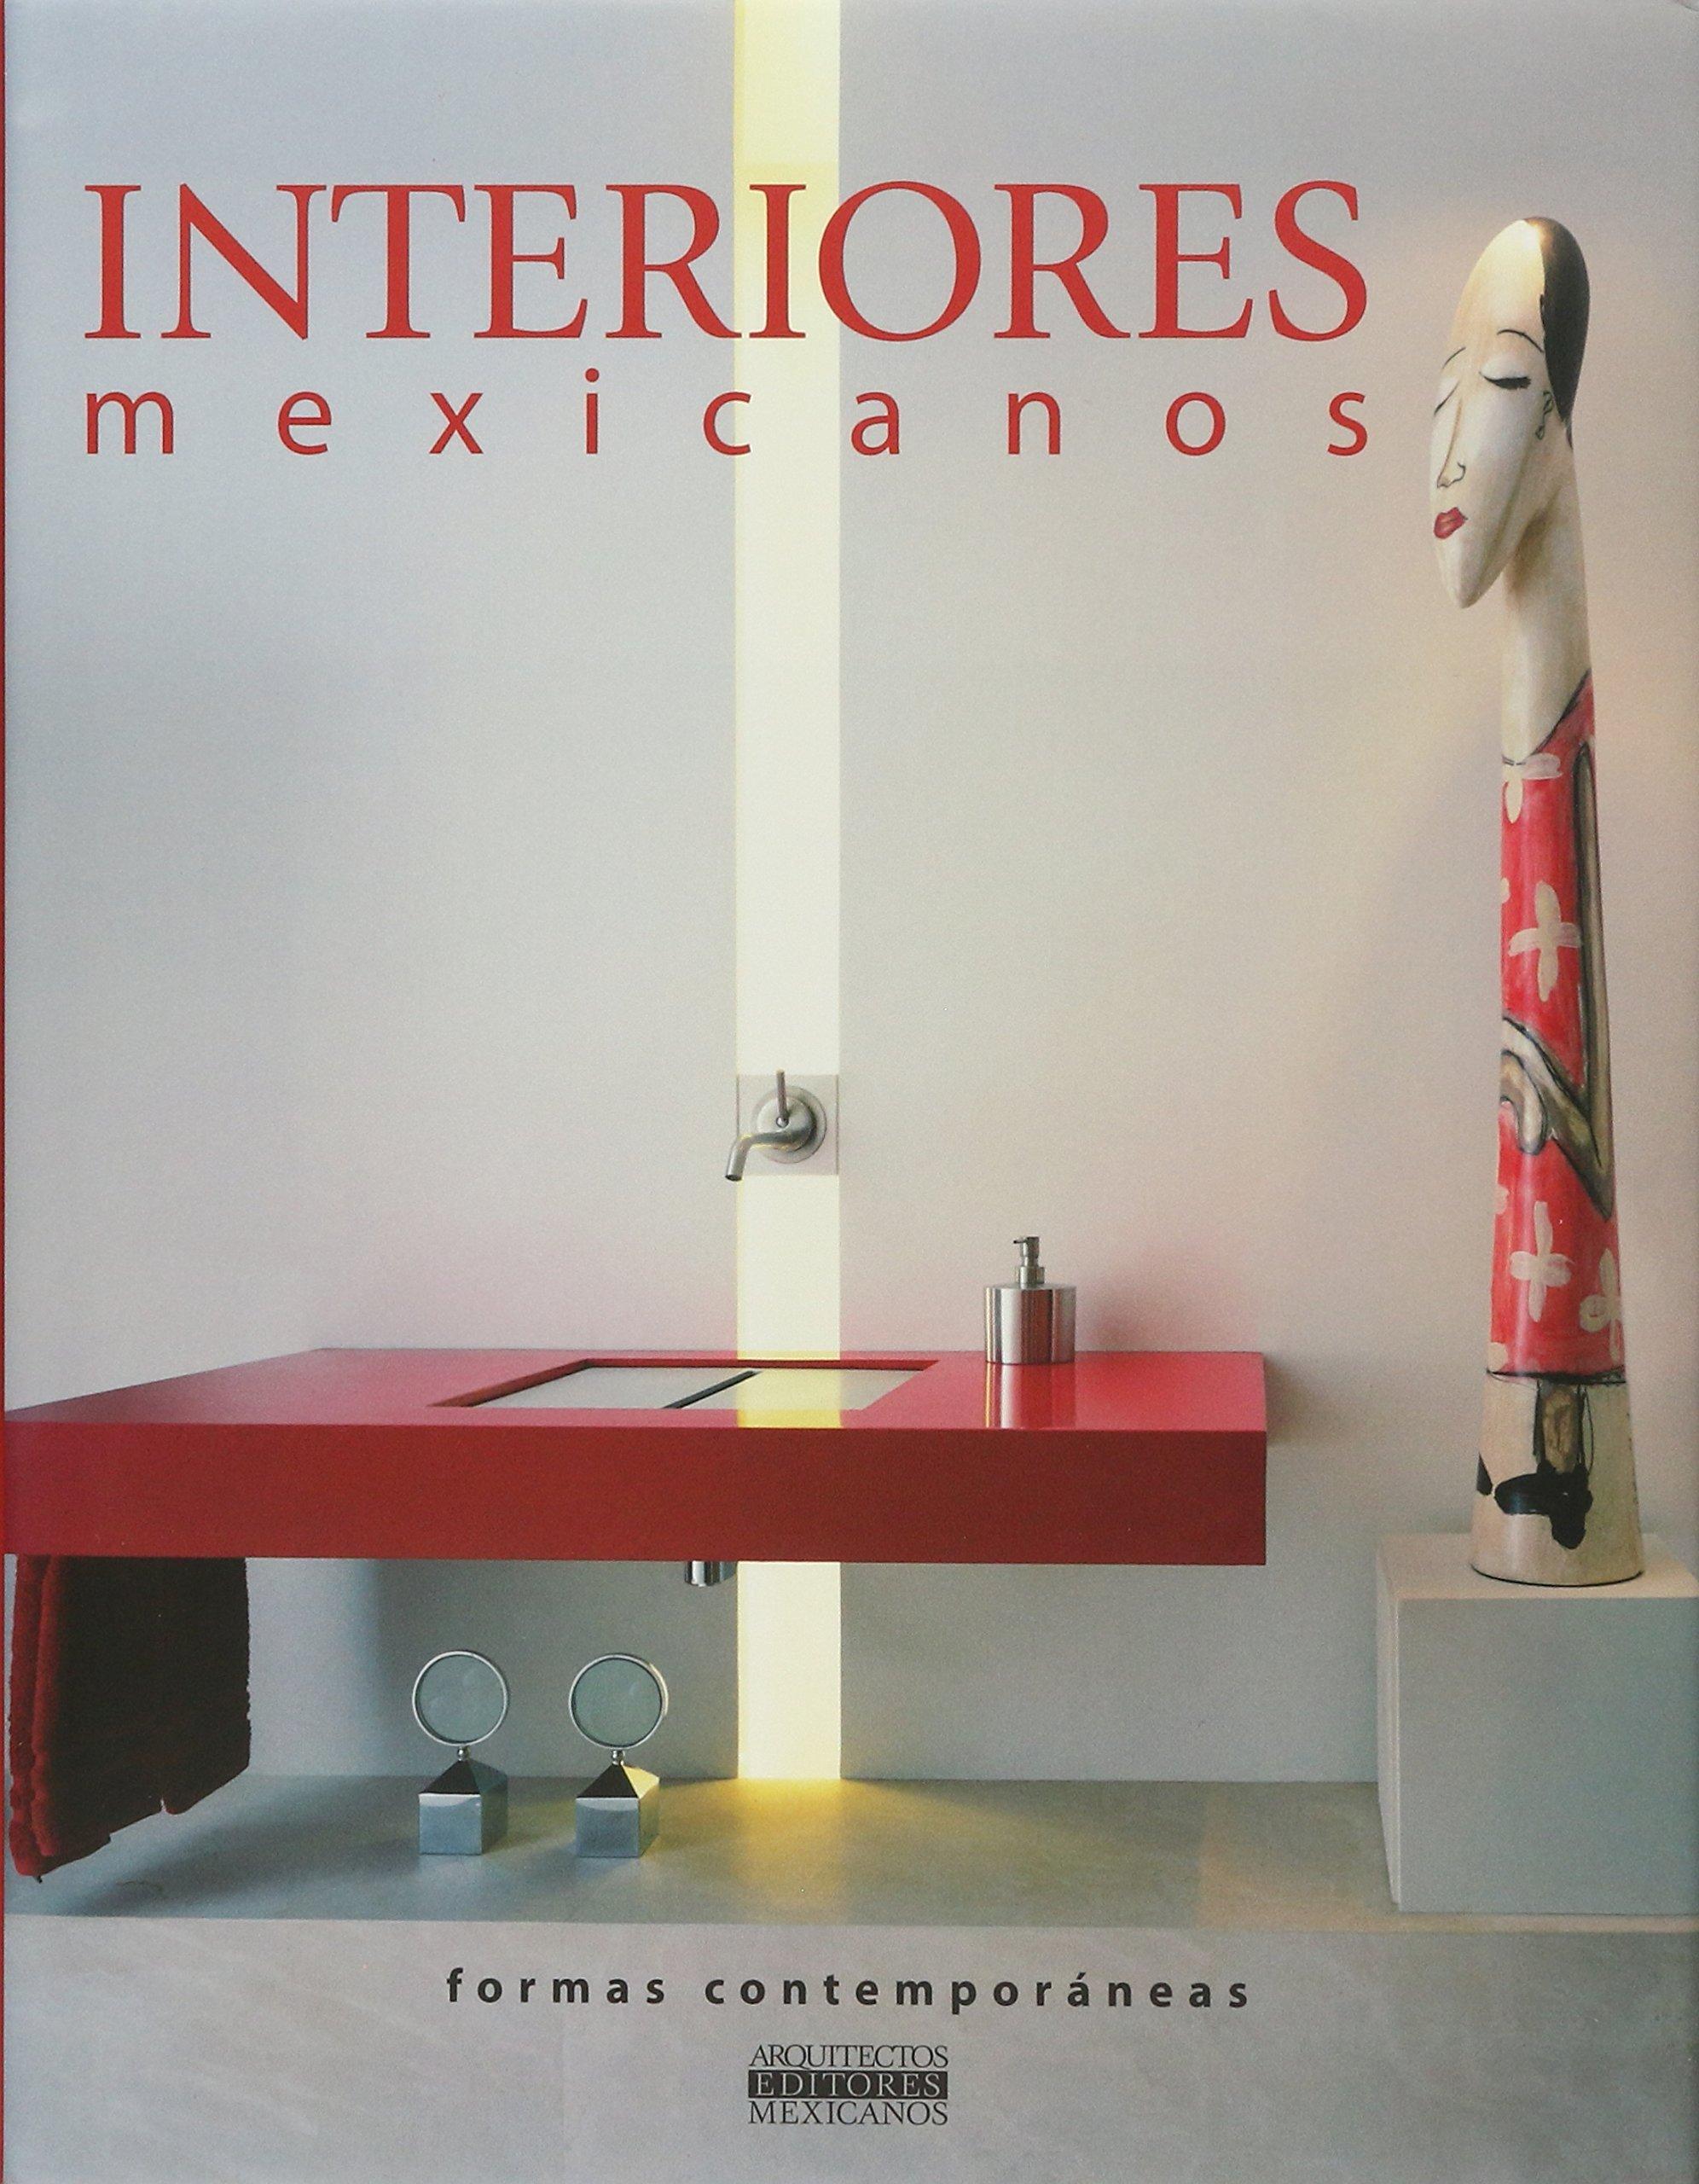 Interiores Mexicanos Formas Contemporaneas English and ...